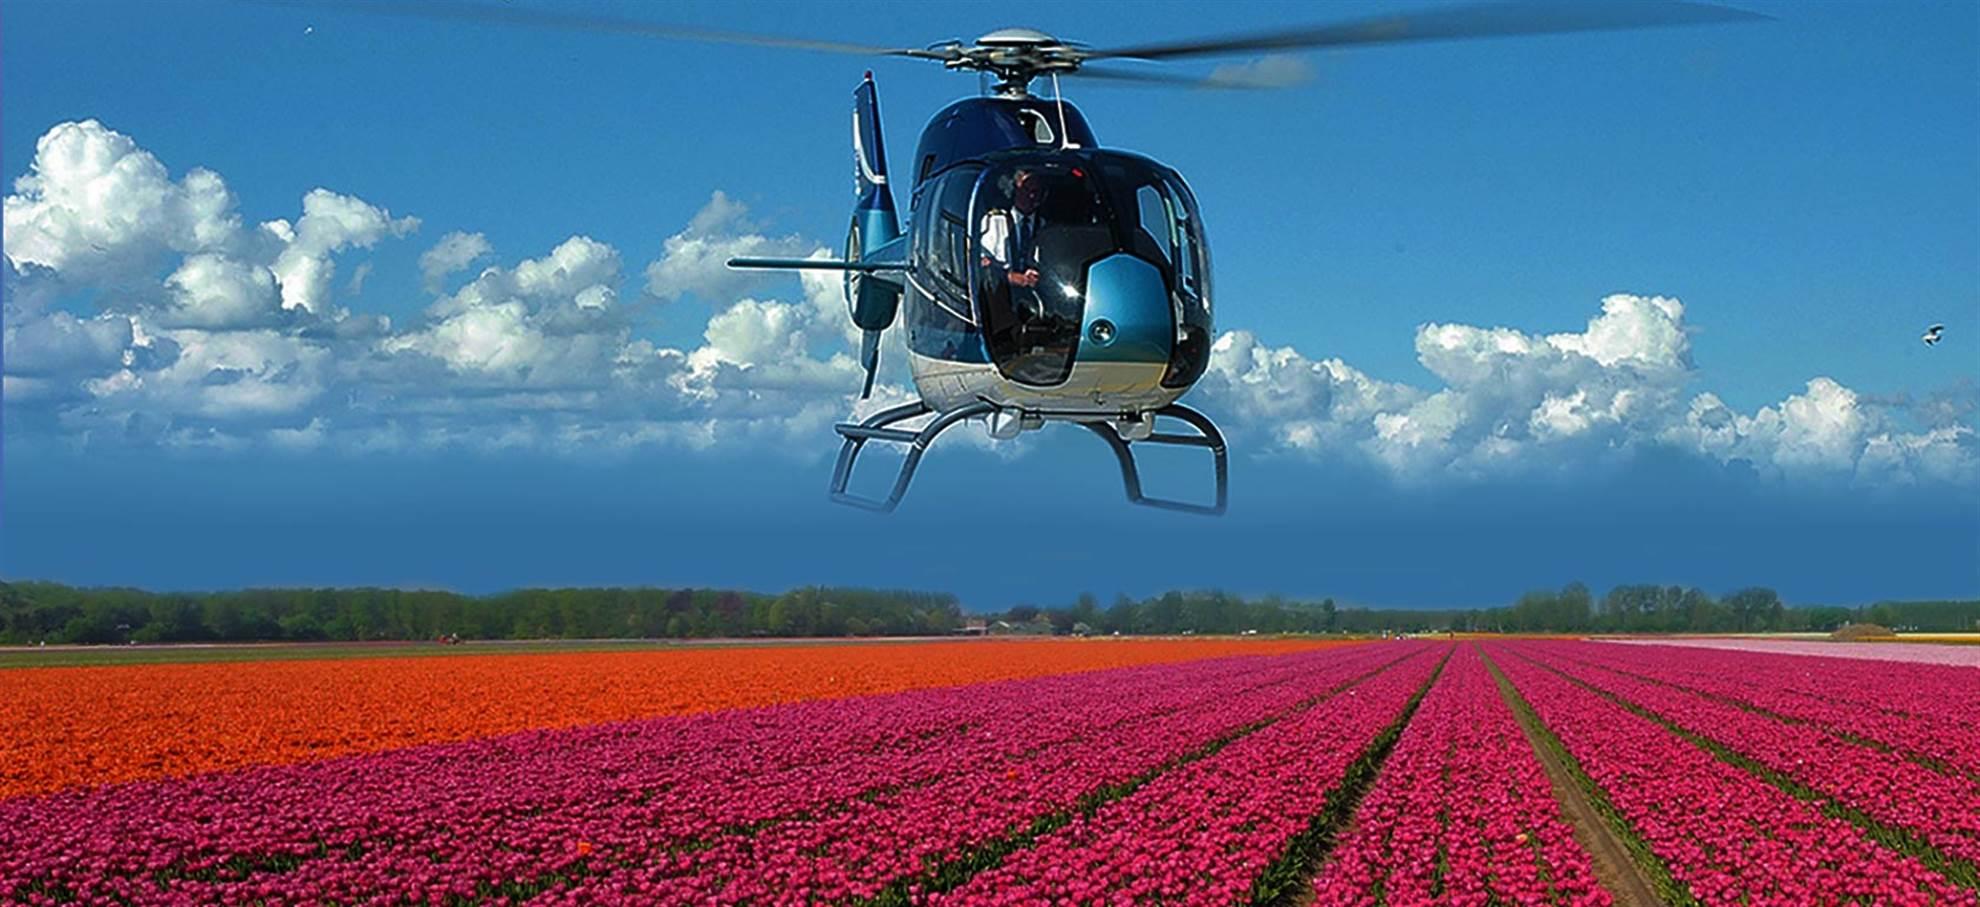 Tour en helicóptero Keukenhof (incl. entrada Keukenhof)